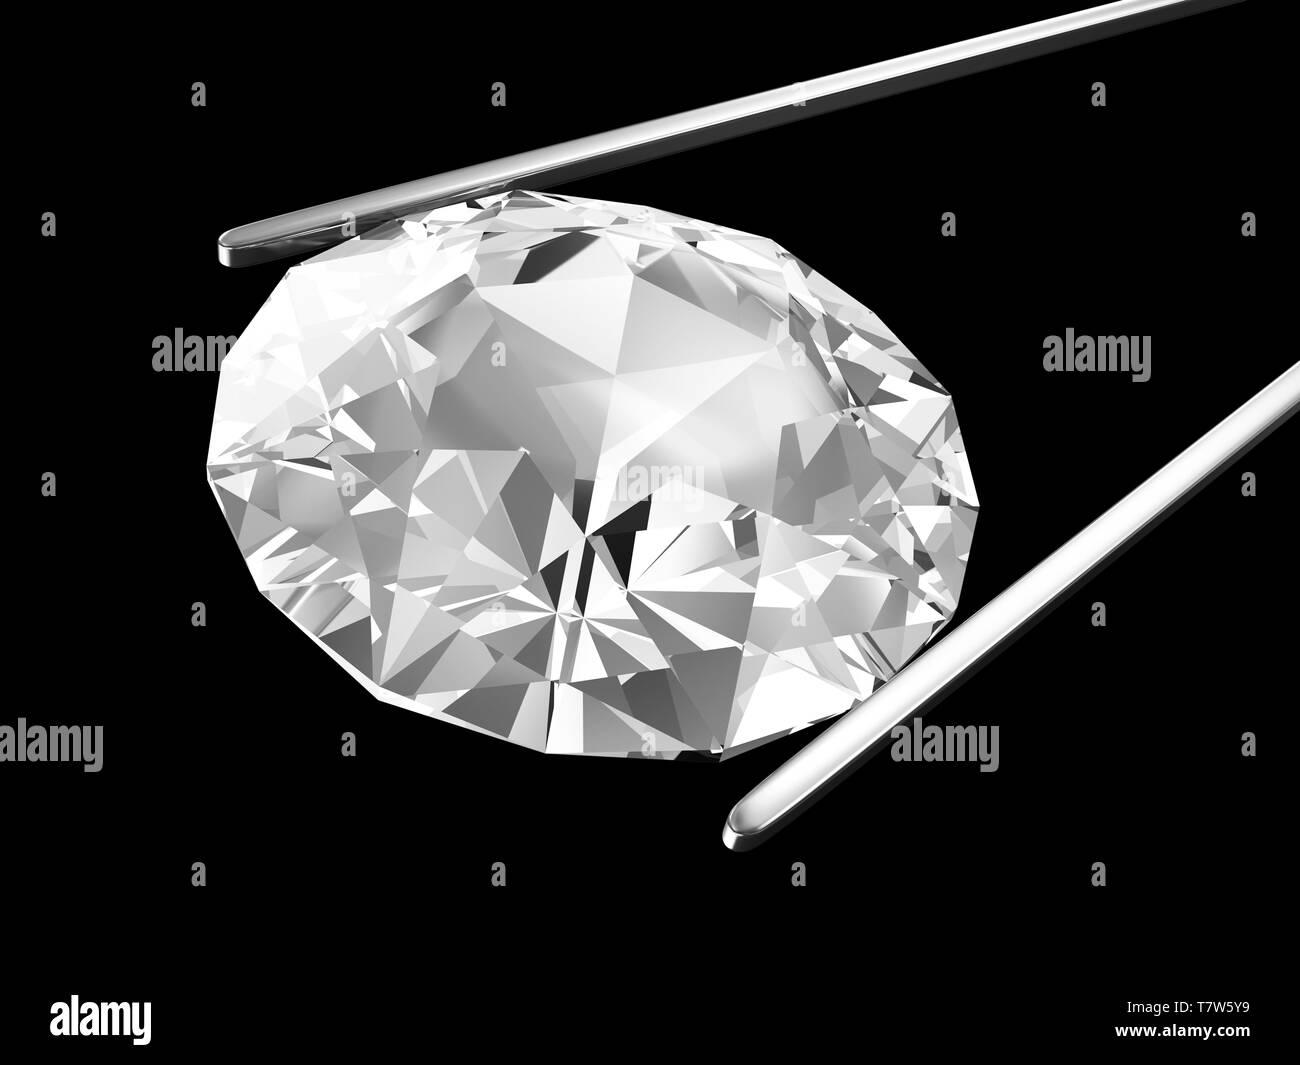 Diamond in the tweezers isolated on black background - Stock Image